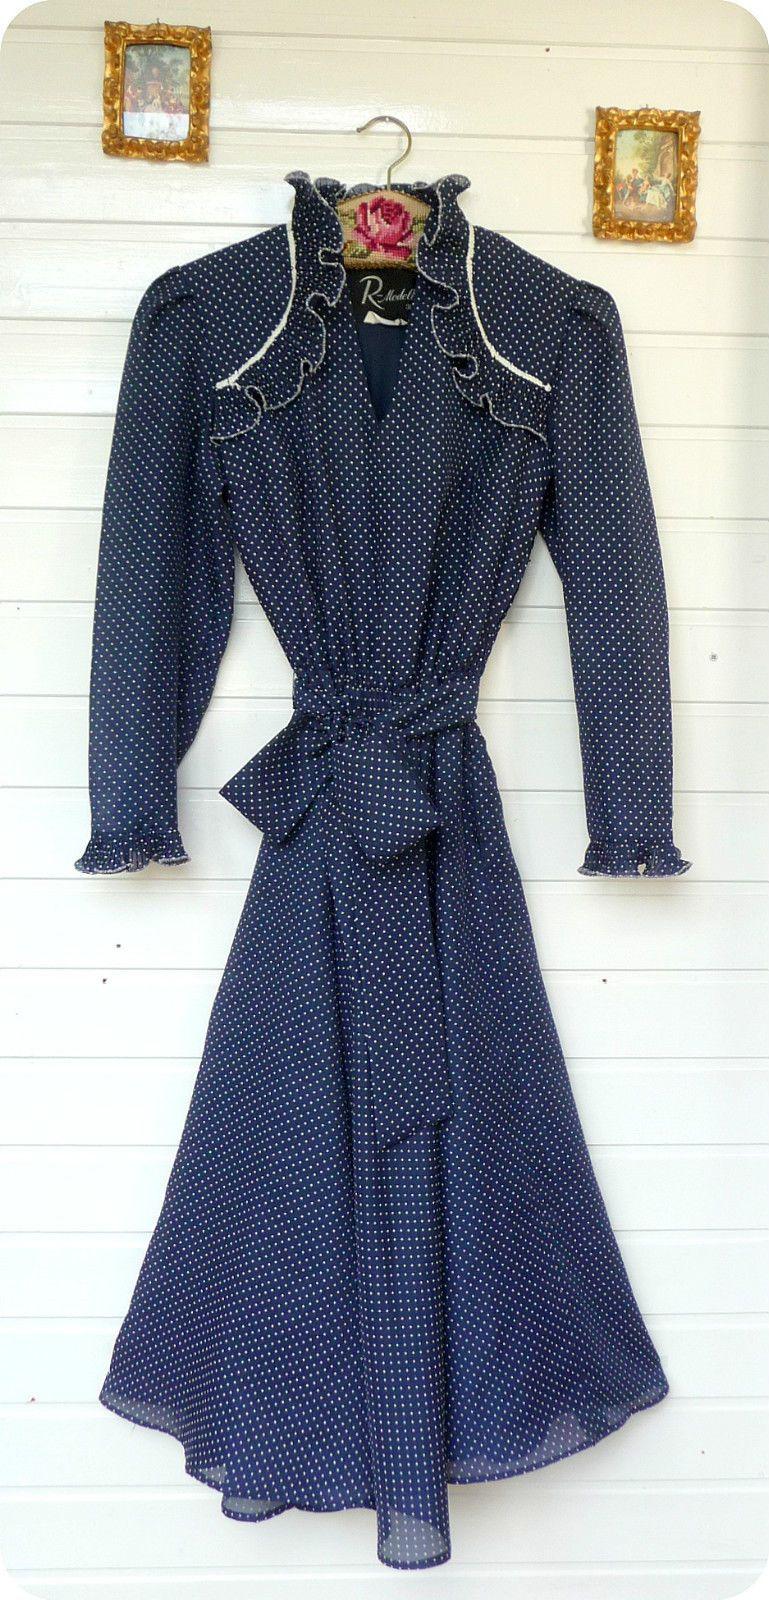 Vintage Traum R. MODELLE Kleid 38 M Dress Pin Up Polka Dots Tanzkleid Bombshell in Kleidung & Accessoires, Vintage-Mode, Vintage-Mode für Damen | eBay